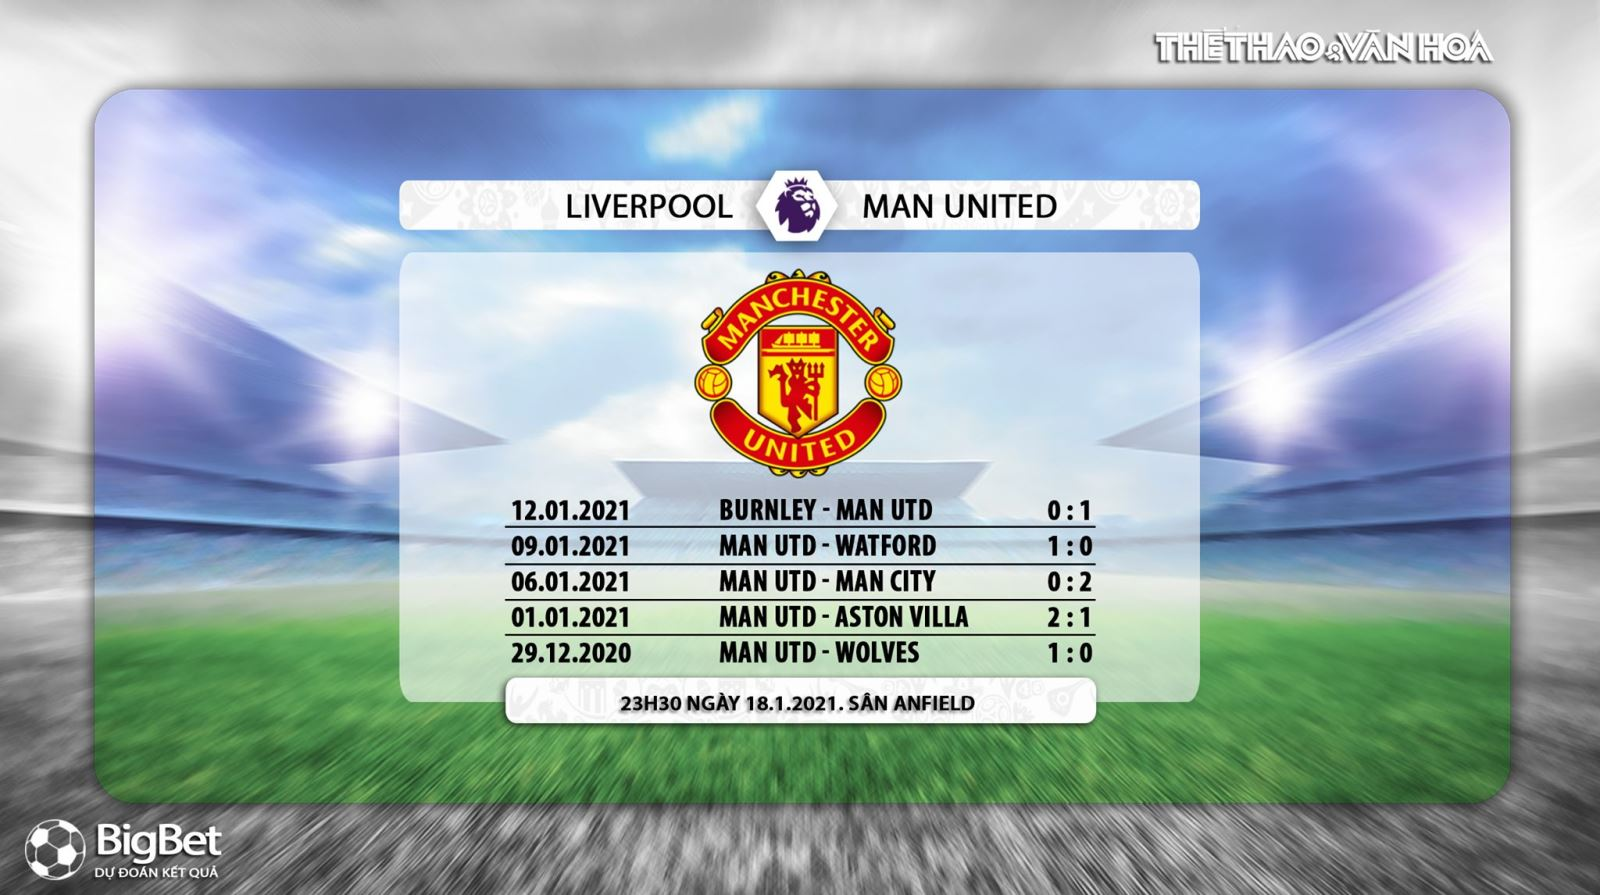 Trực tiếp Liverpool vs MU, K+, K+PM, MU, Trực tiếp bóng đá Anh hôm nay, Liverpool vs MU, Kèo nhà cái MU, xem trực tiếp MU đấu với Liverpool, trực tiếp Ngoại hạng Anh